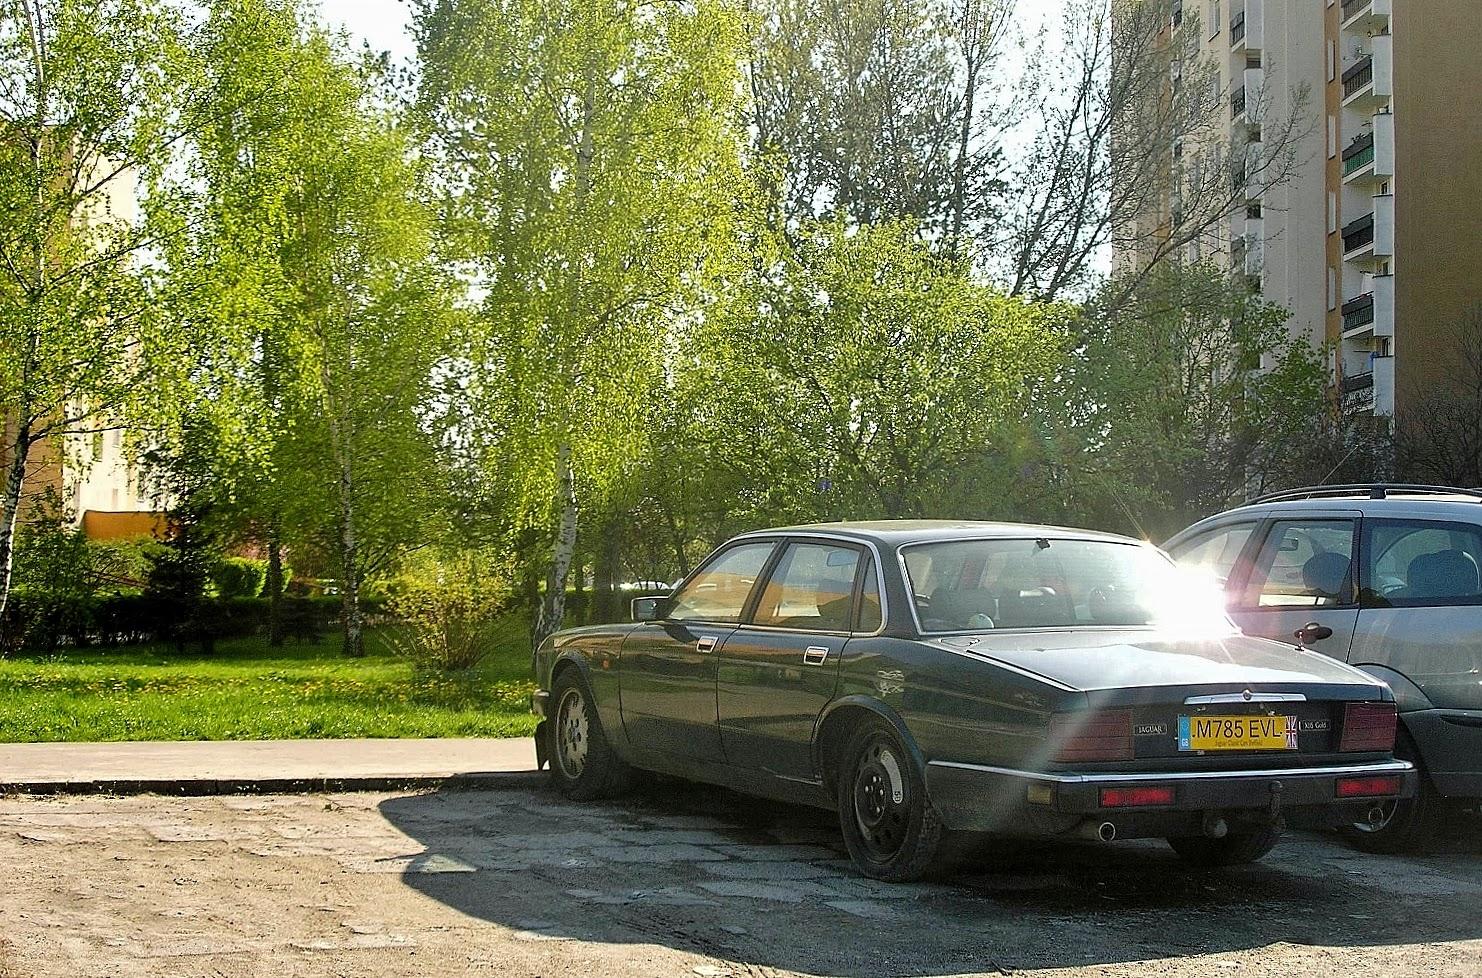 Pobliska Ulica: 1994 Jaguar XJ6 Gold (XJ40)